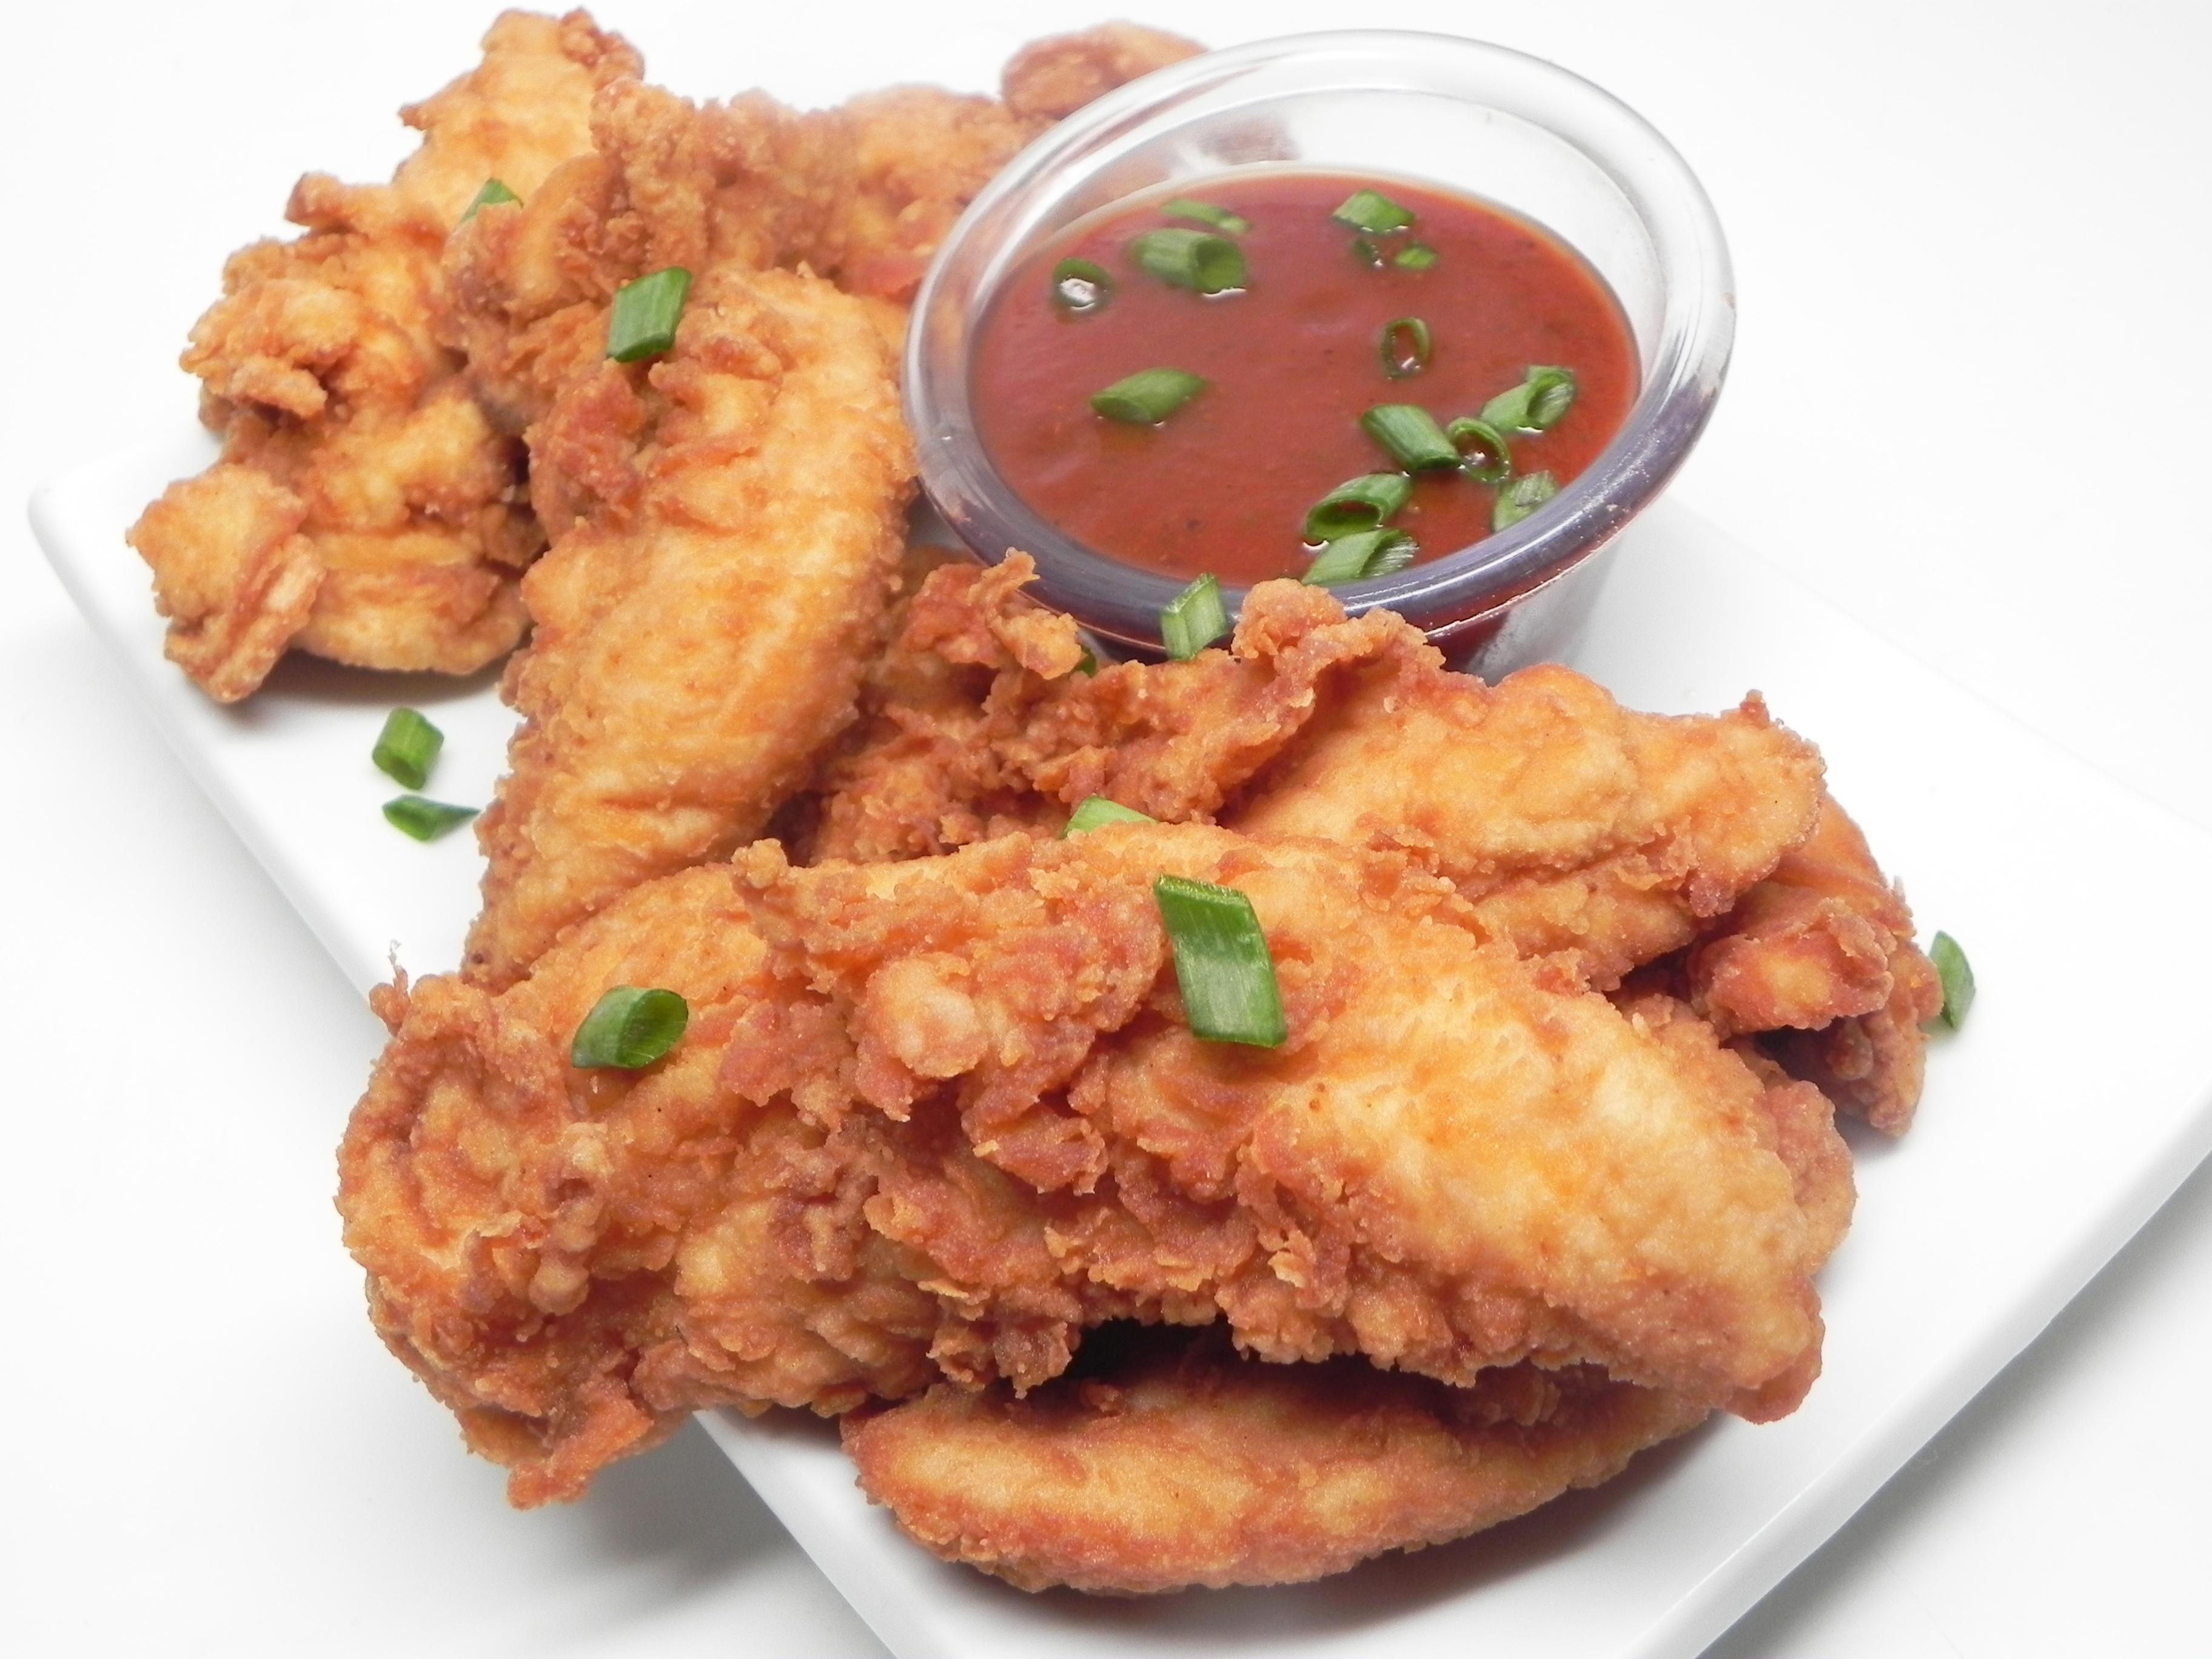 CSC (Cinnamon Sugar Cocoa) Fried Chicken Strips Jhustin Pierce